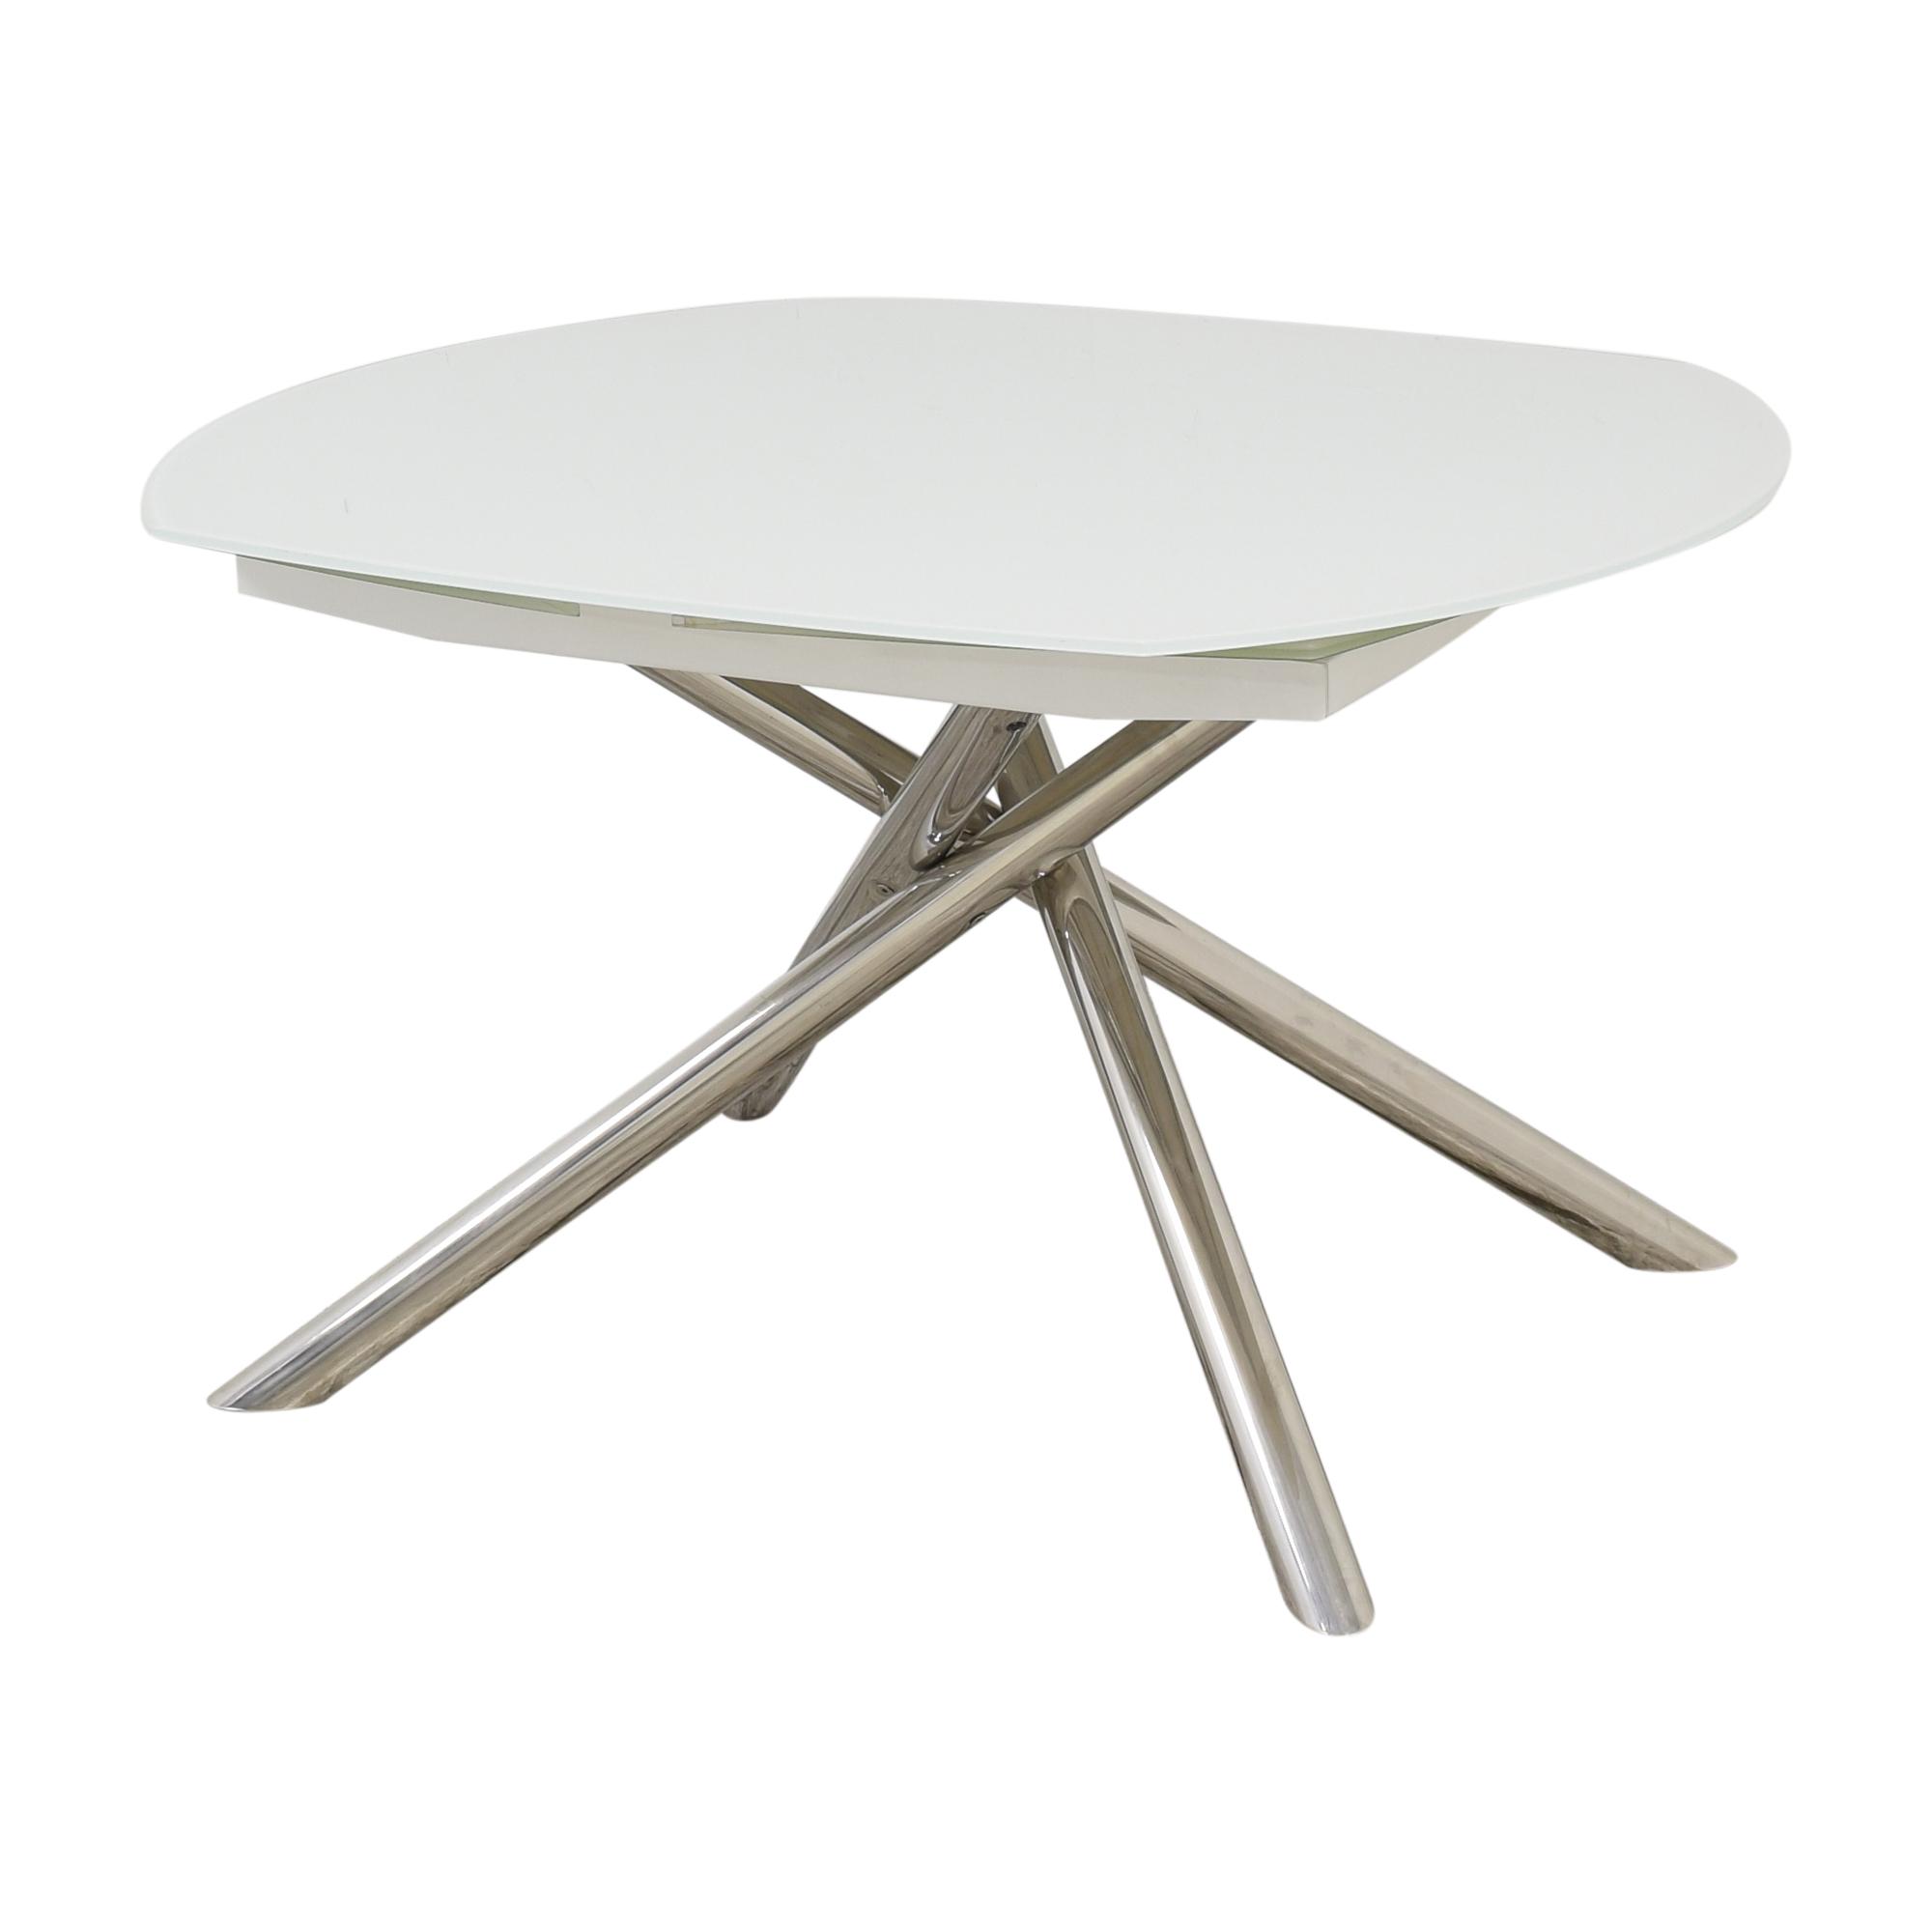 Modani Modani Astro Extendable Dining Table nyc